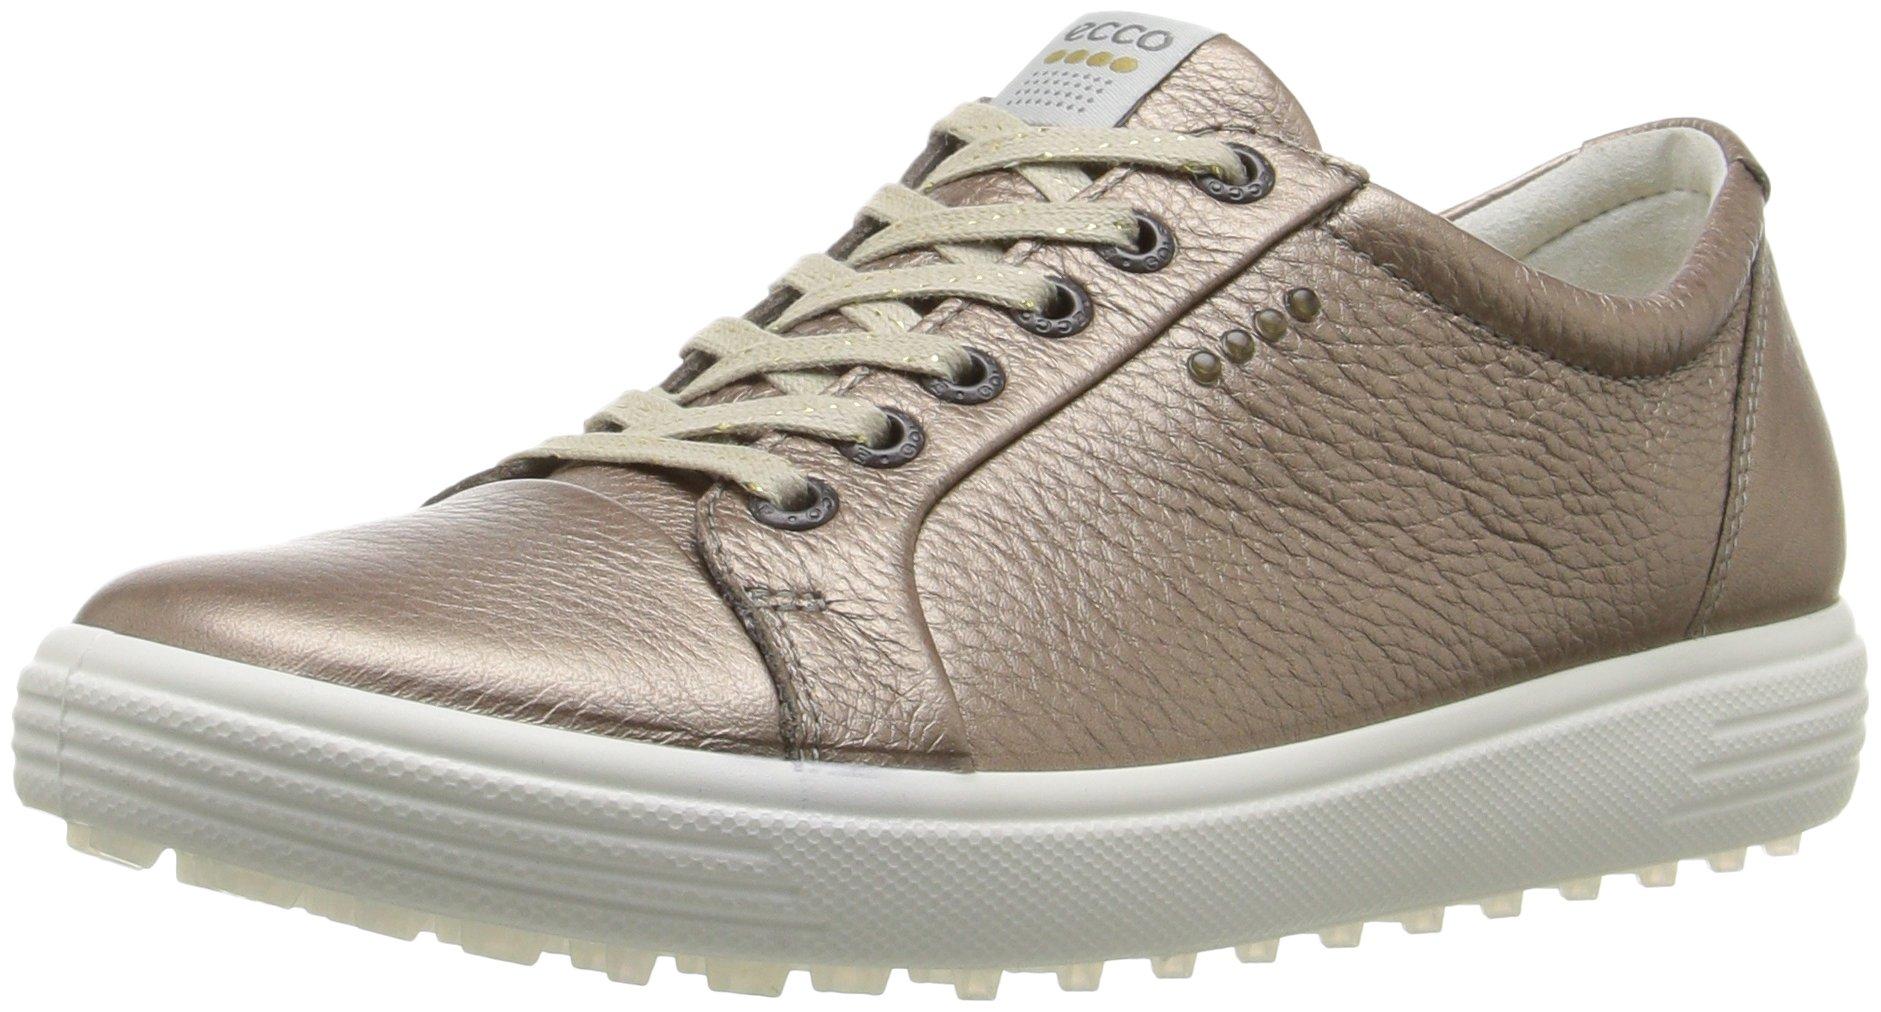 ECCO Women's Casual Hybrid Golf Shoes, Grau (1375WARM Grey), 3 UK